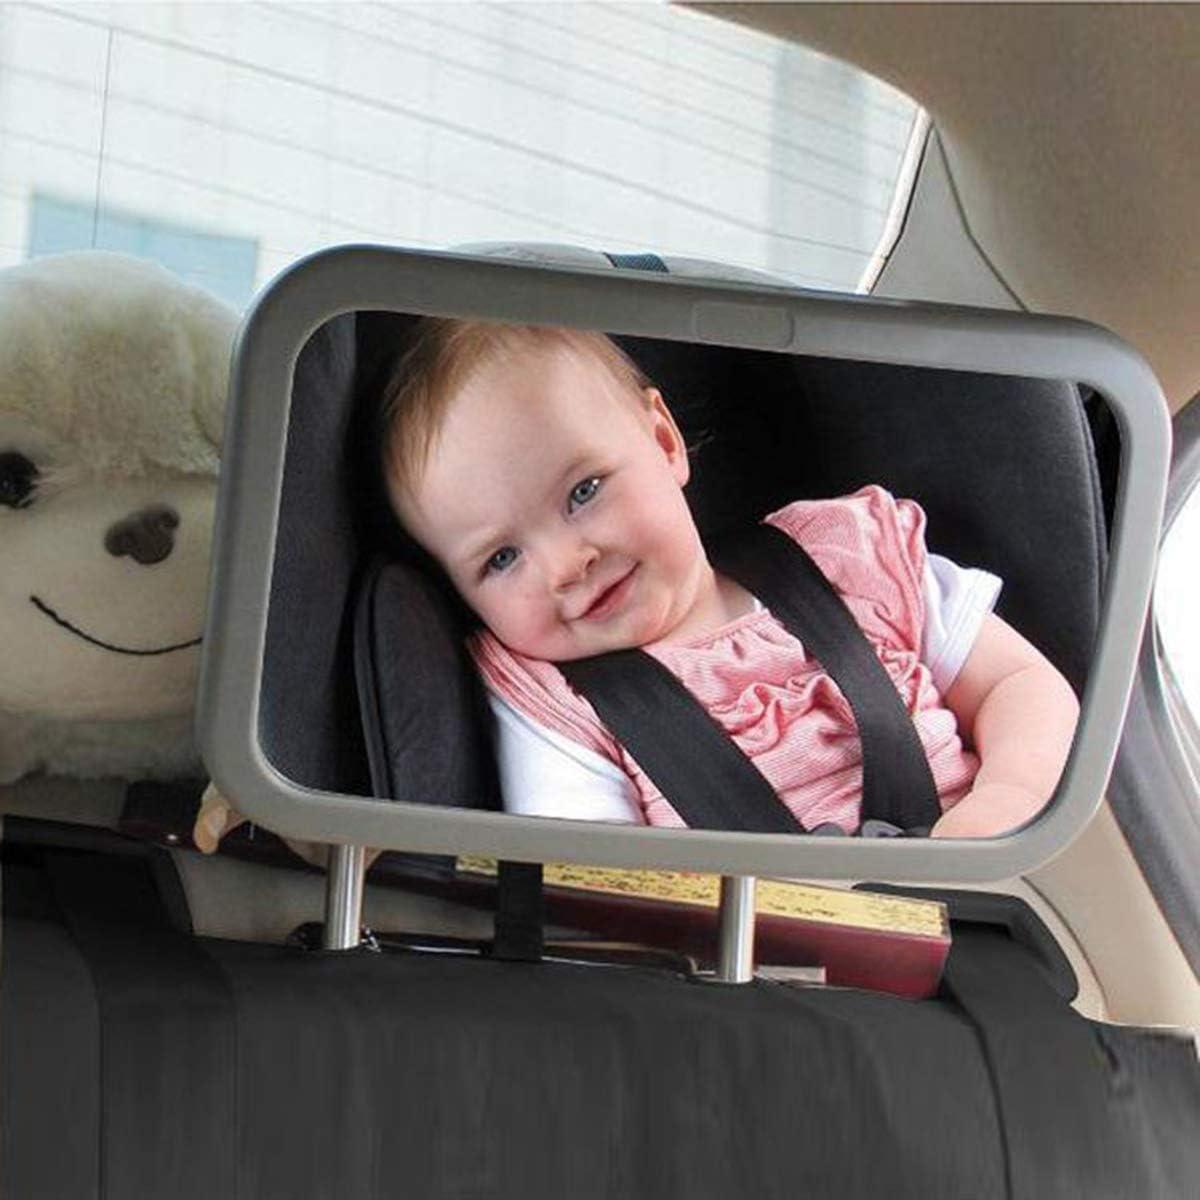 Safety Car Seat Mirror for Rear Facing Car Headrest Mount View Rear Mirror Car Baby Rear Facing Mirror puseky Baby Car Mirror